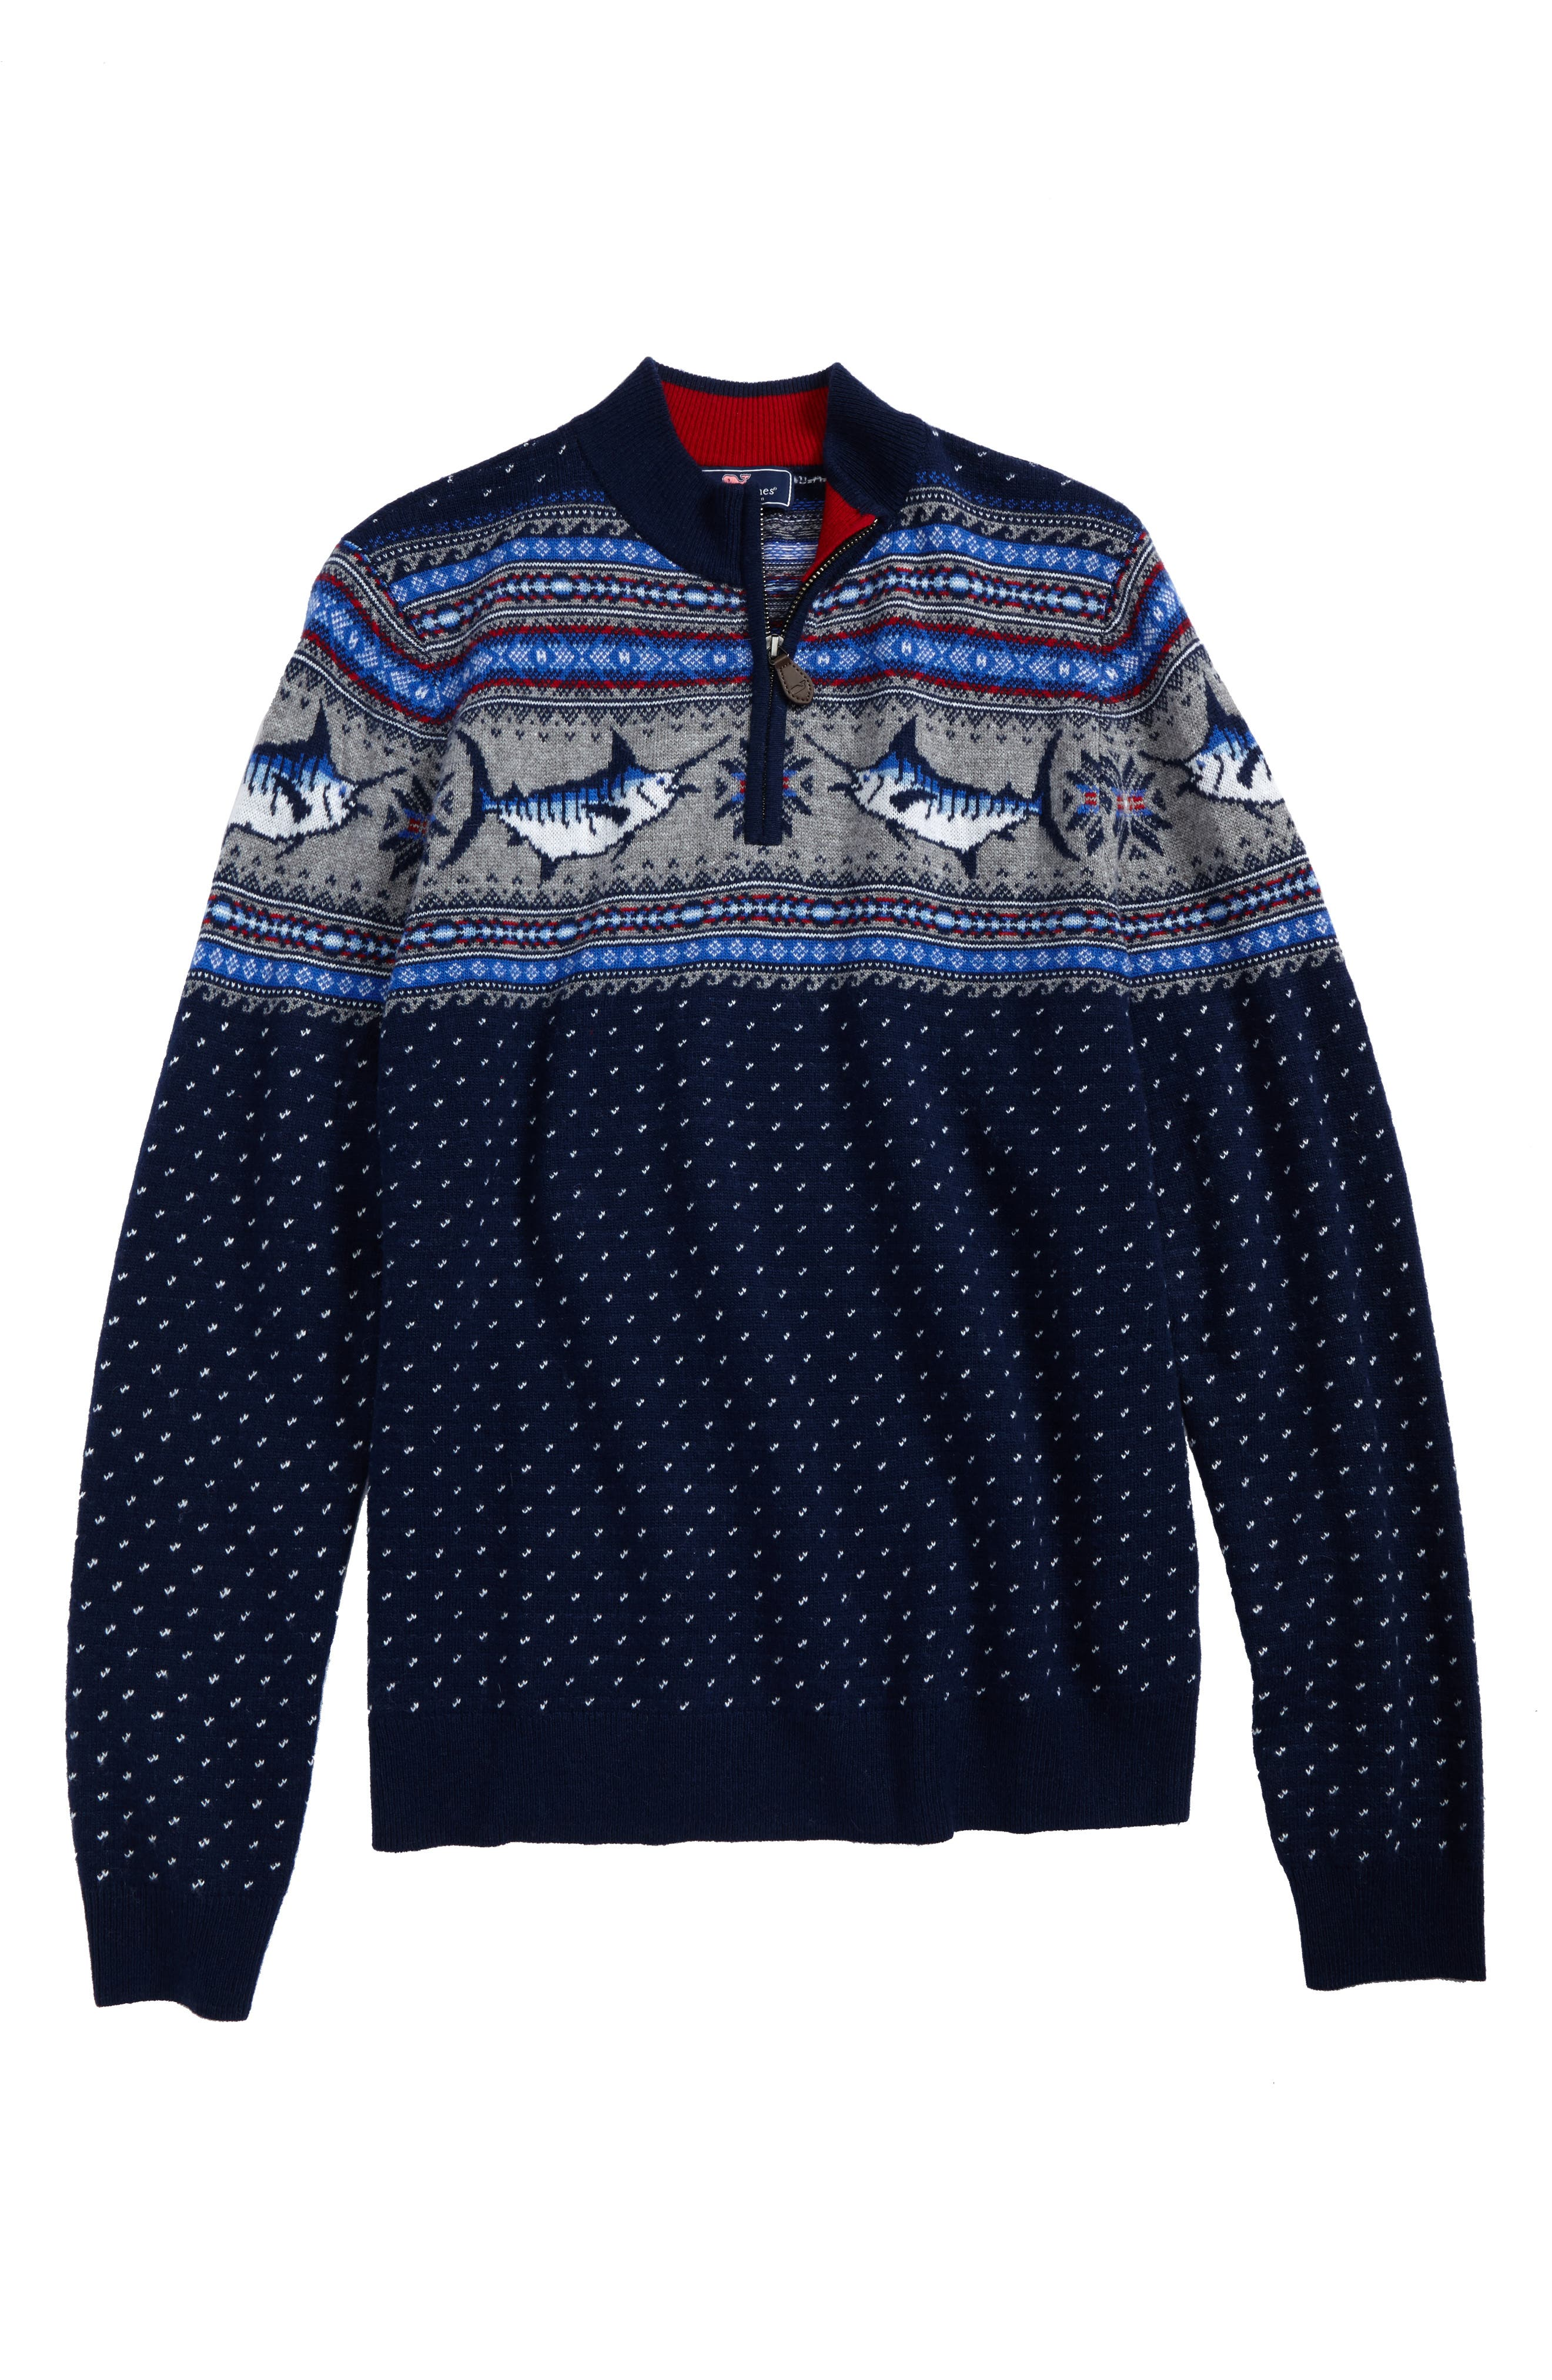 Marlin Whale Intarsia Quarter Zip Sweater,                         Main,                         color,